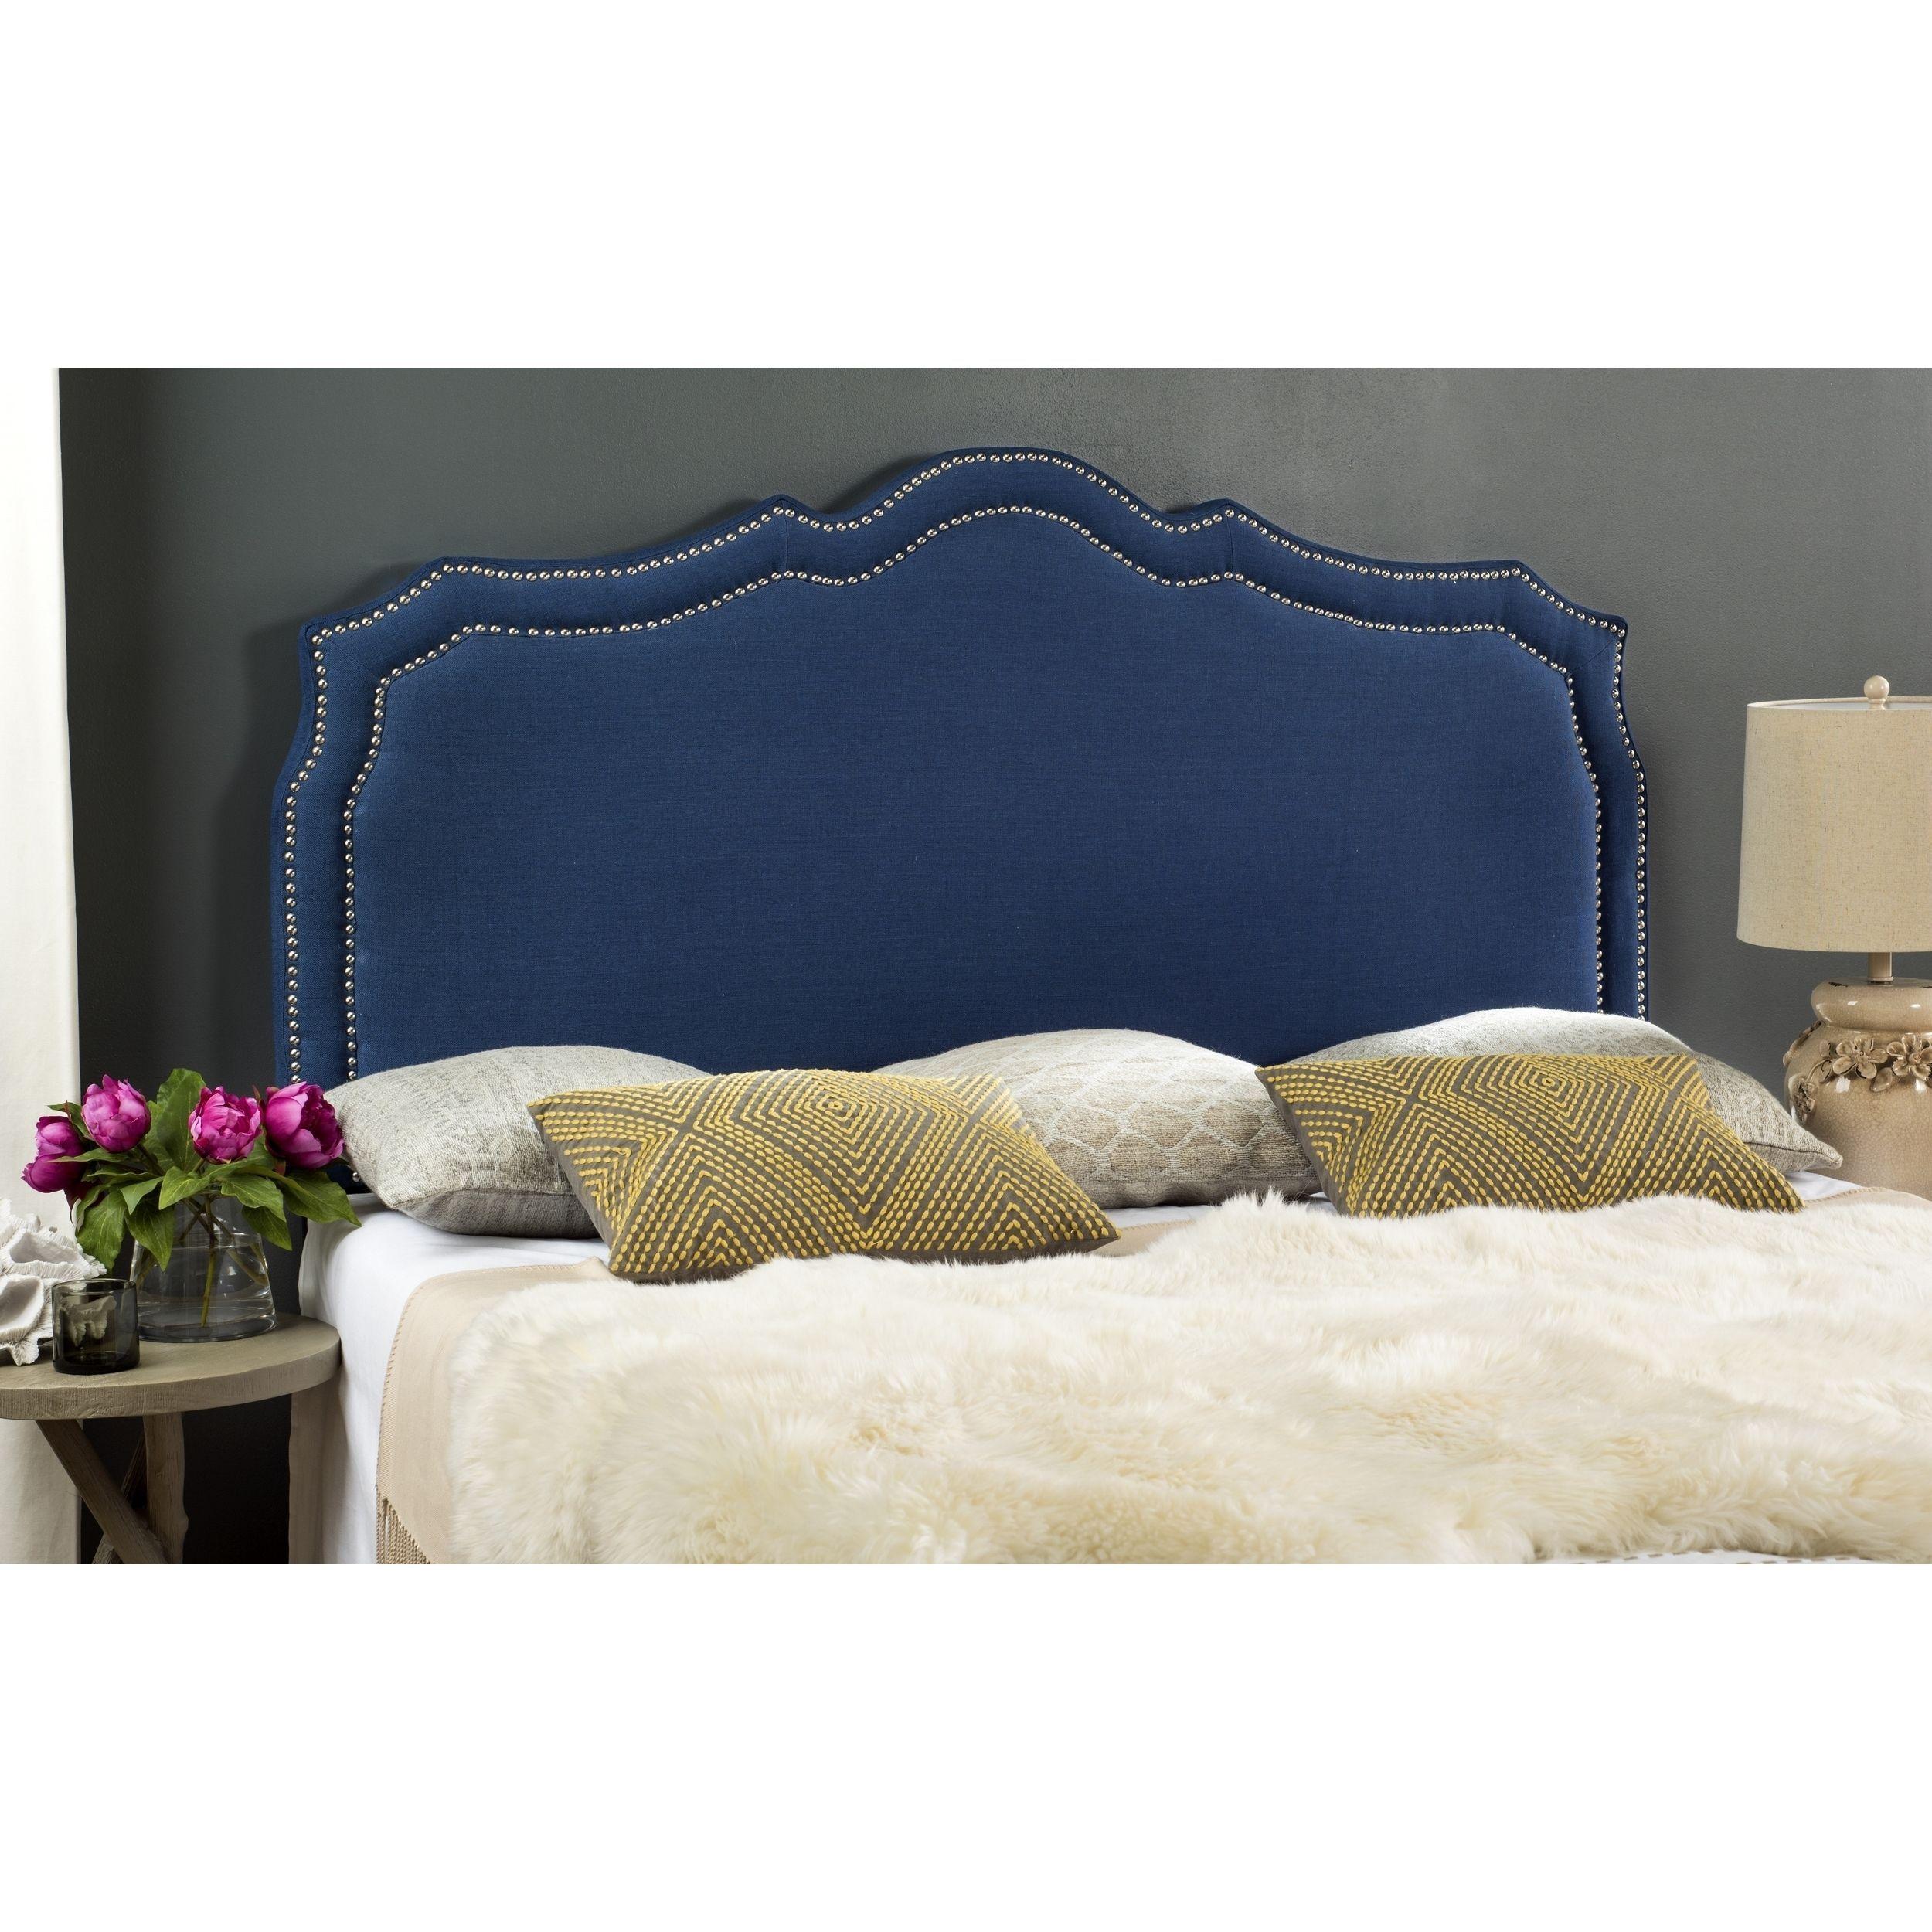 Safavieh Skyler Steel Linen Upholstered Headboard - Silver Nailhead